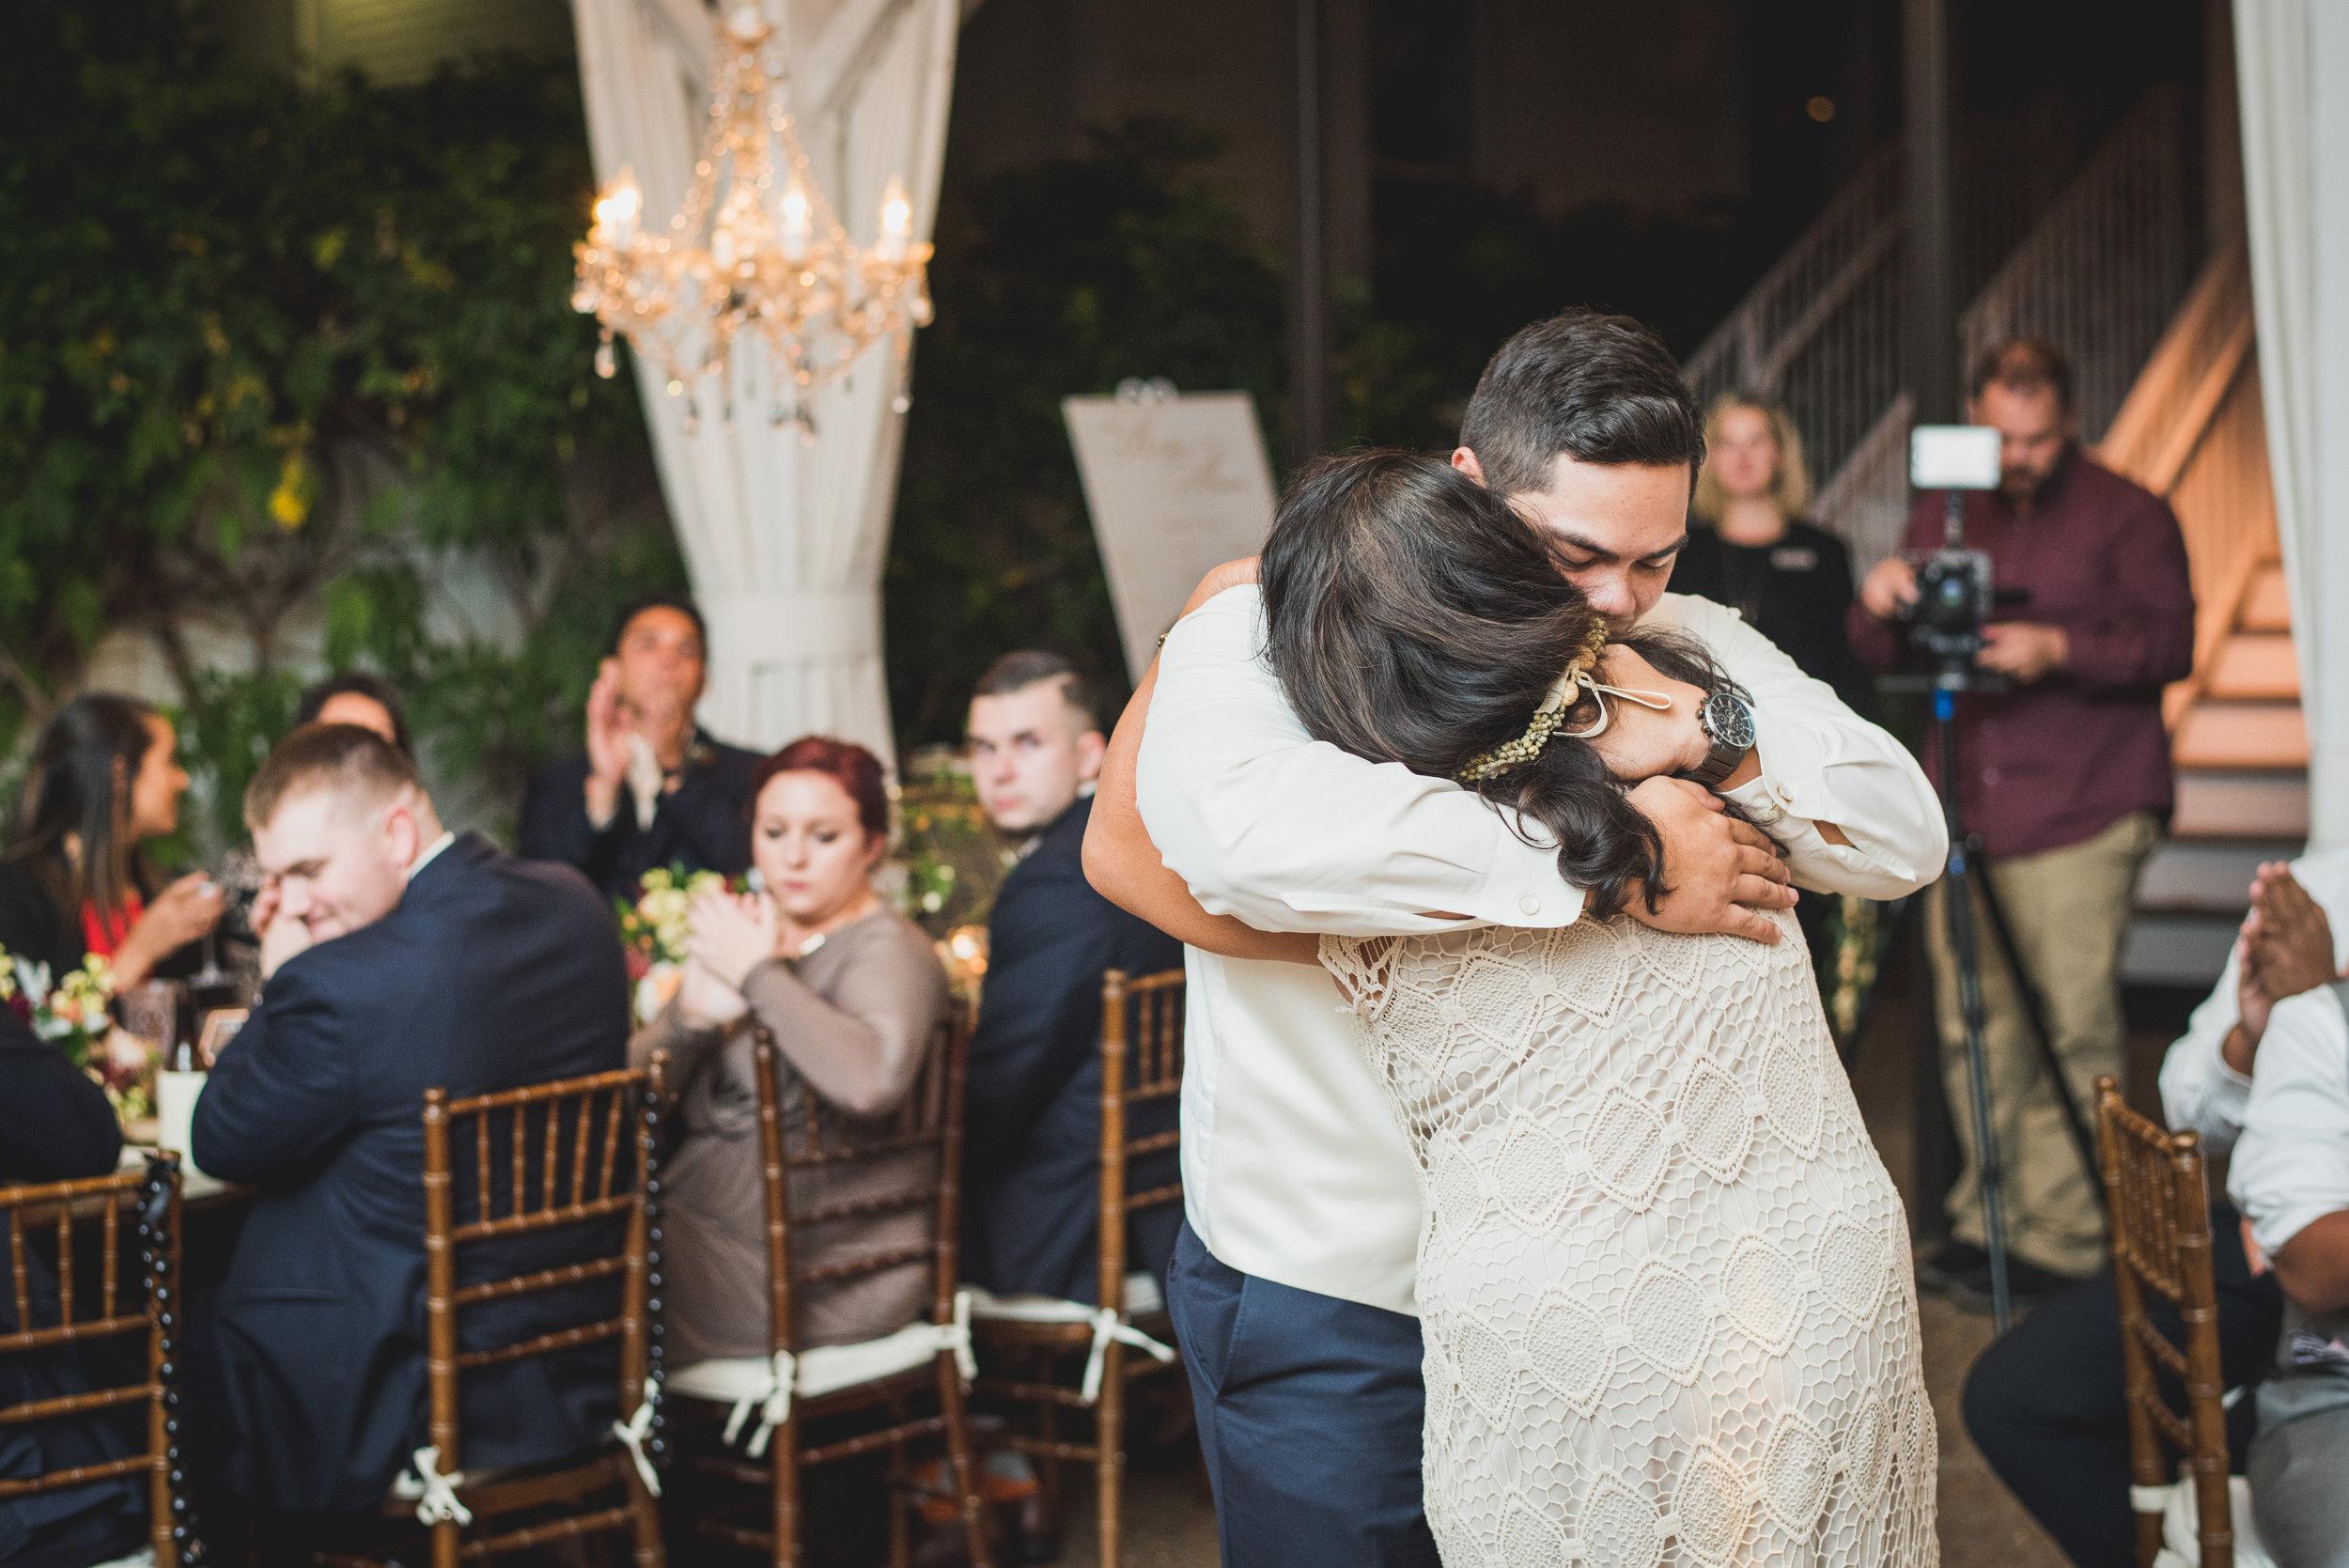 Nashville-wedding-photographers-CJ's-Off-The-Square-63.JPG